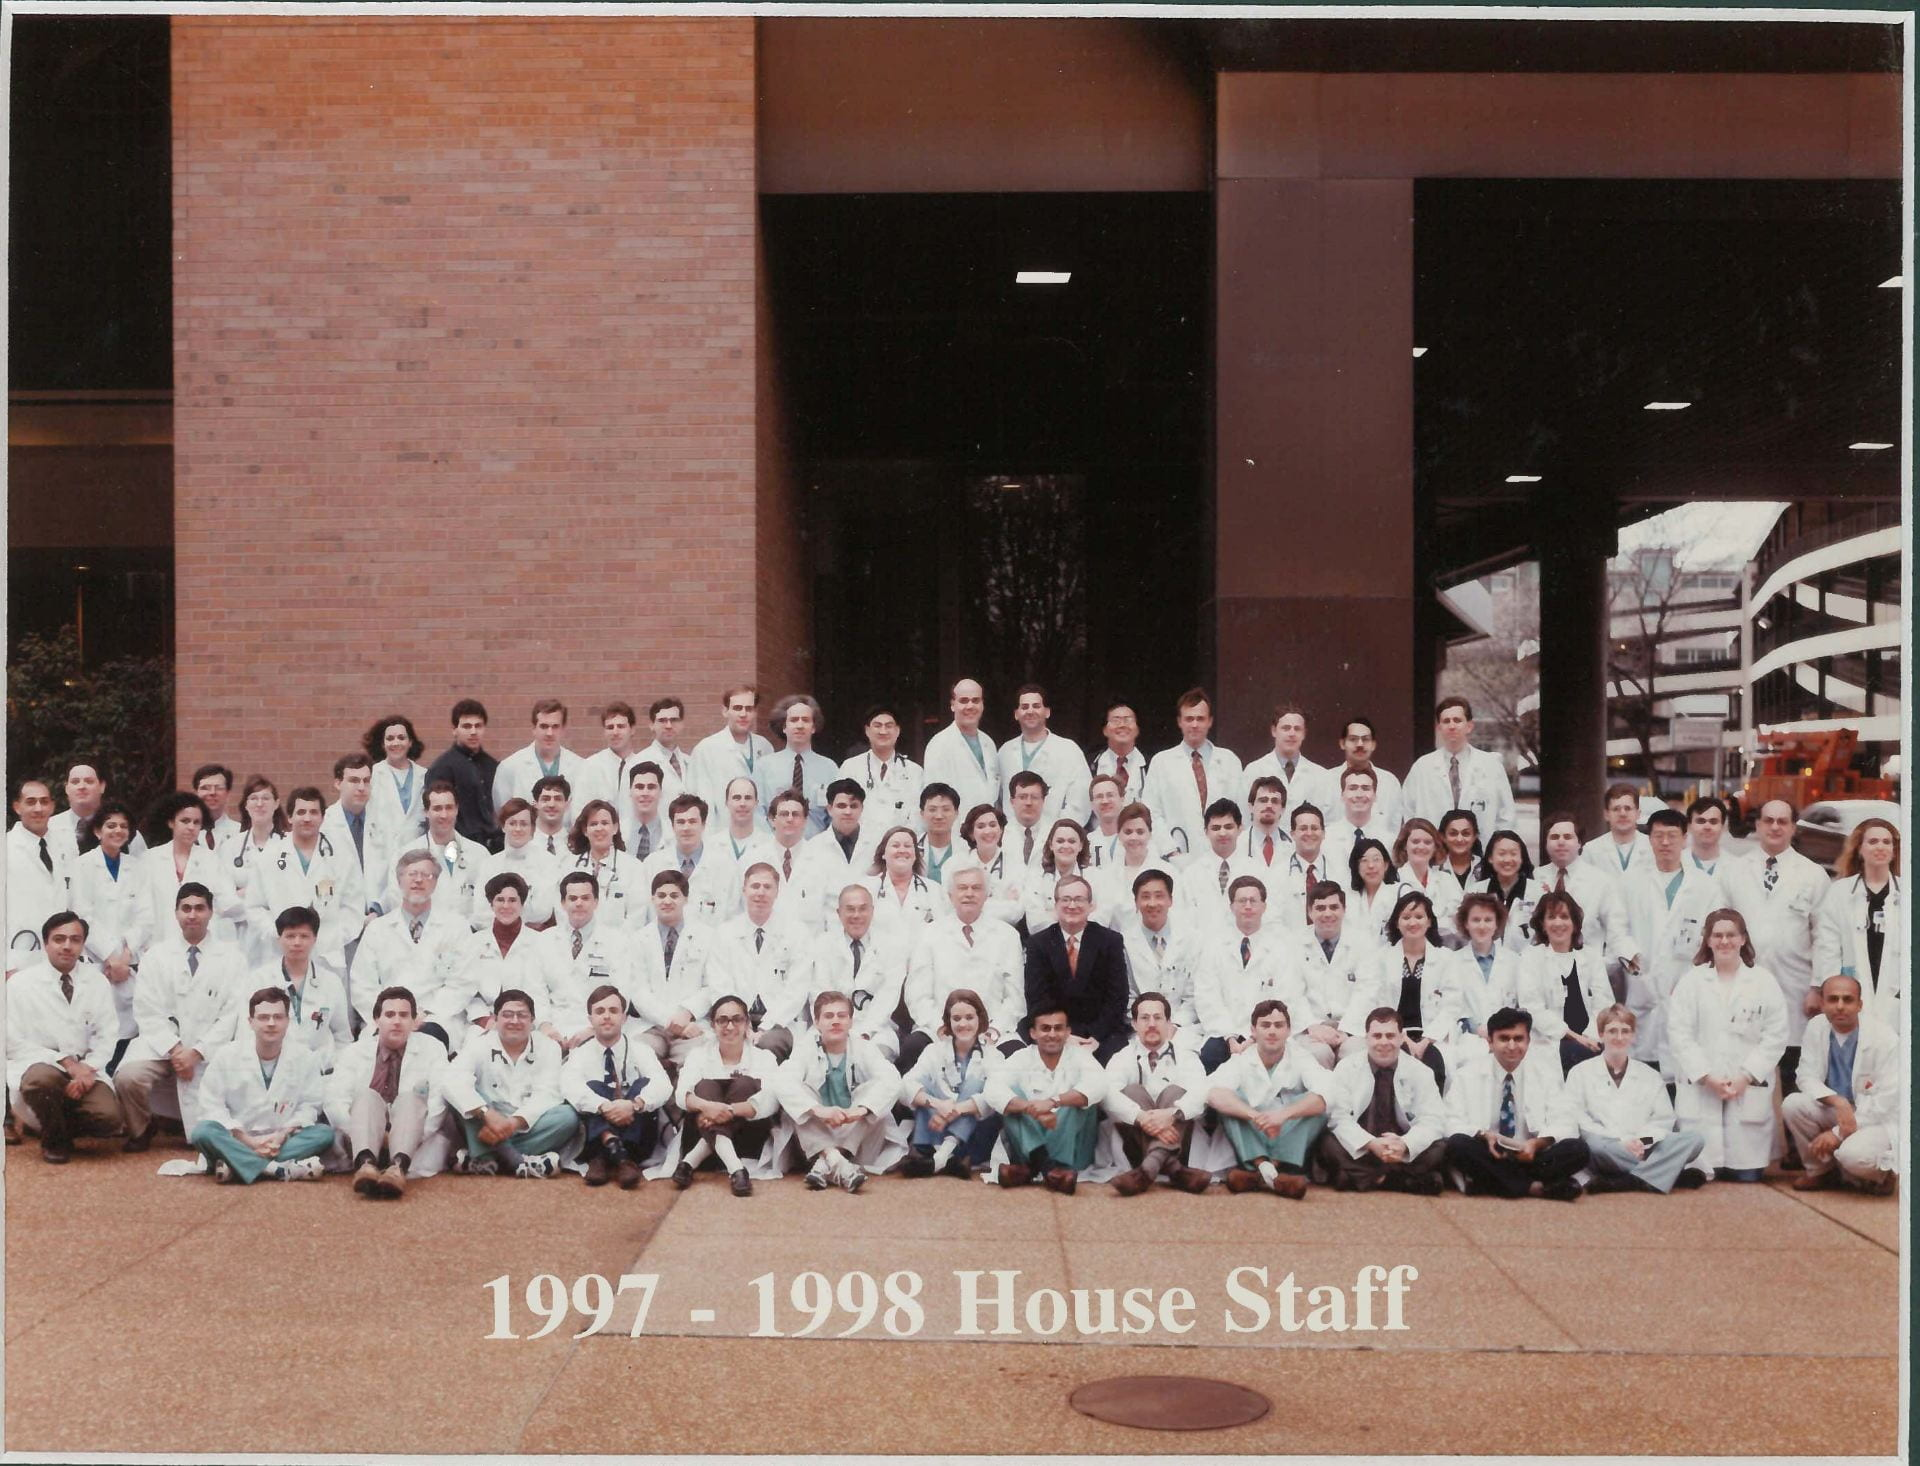 1997 Housestaff Photo